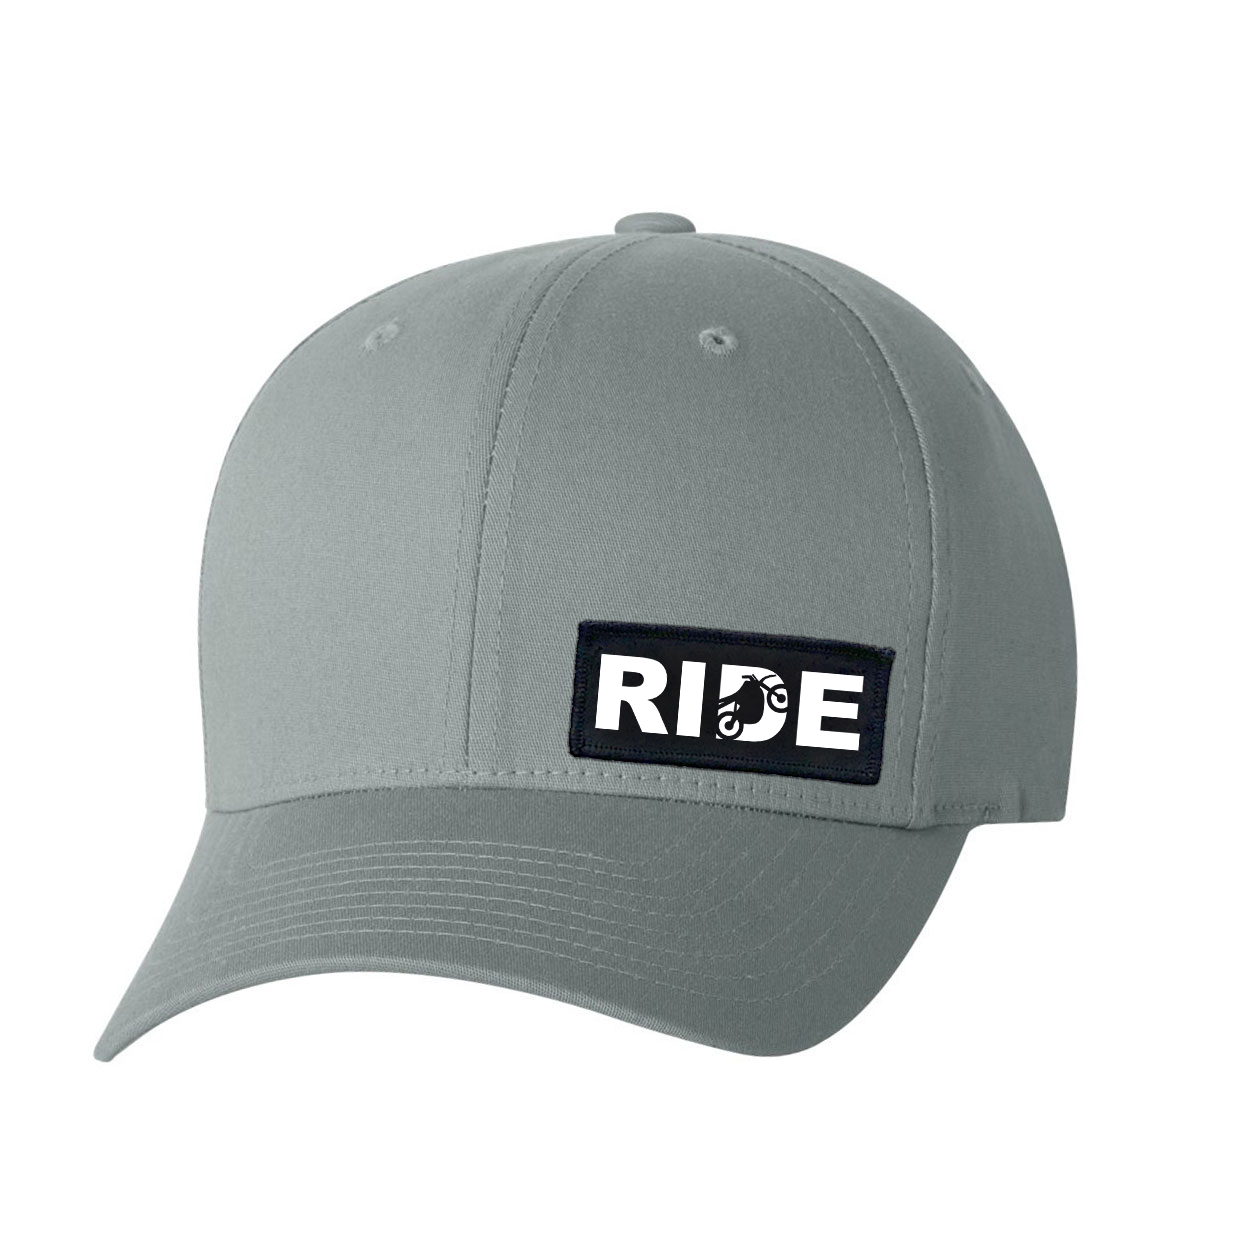 Ride Moto Logo Night Out Woven Patch Flex-Fit Hat Gray (White Logo)